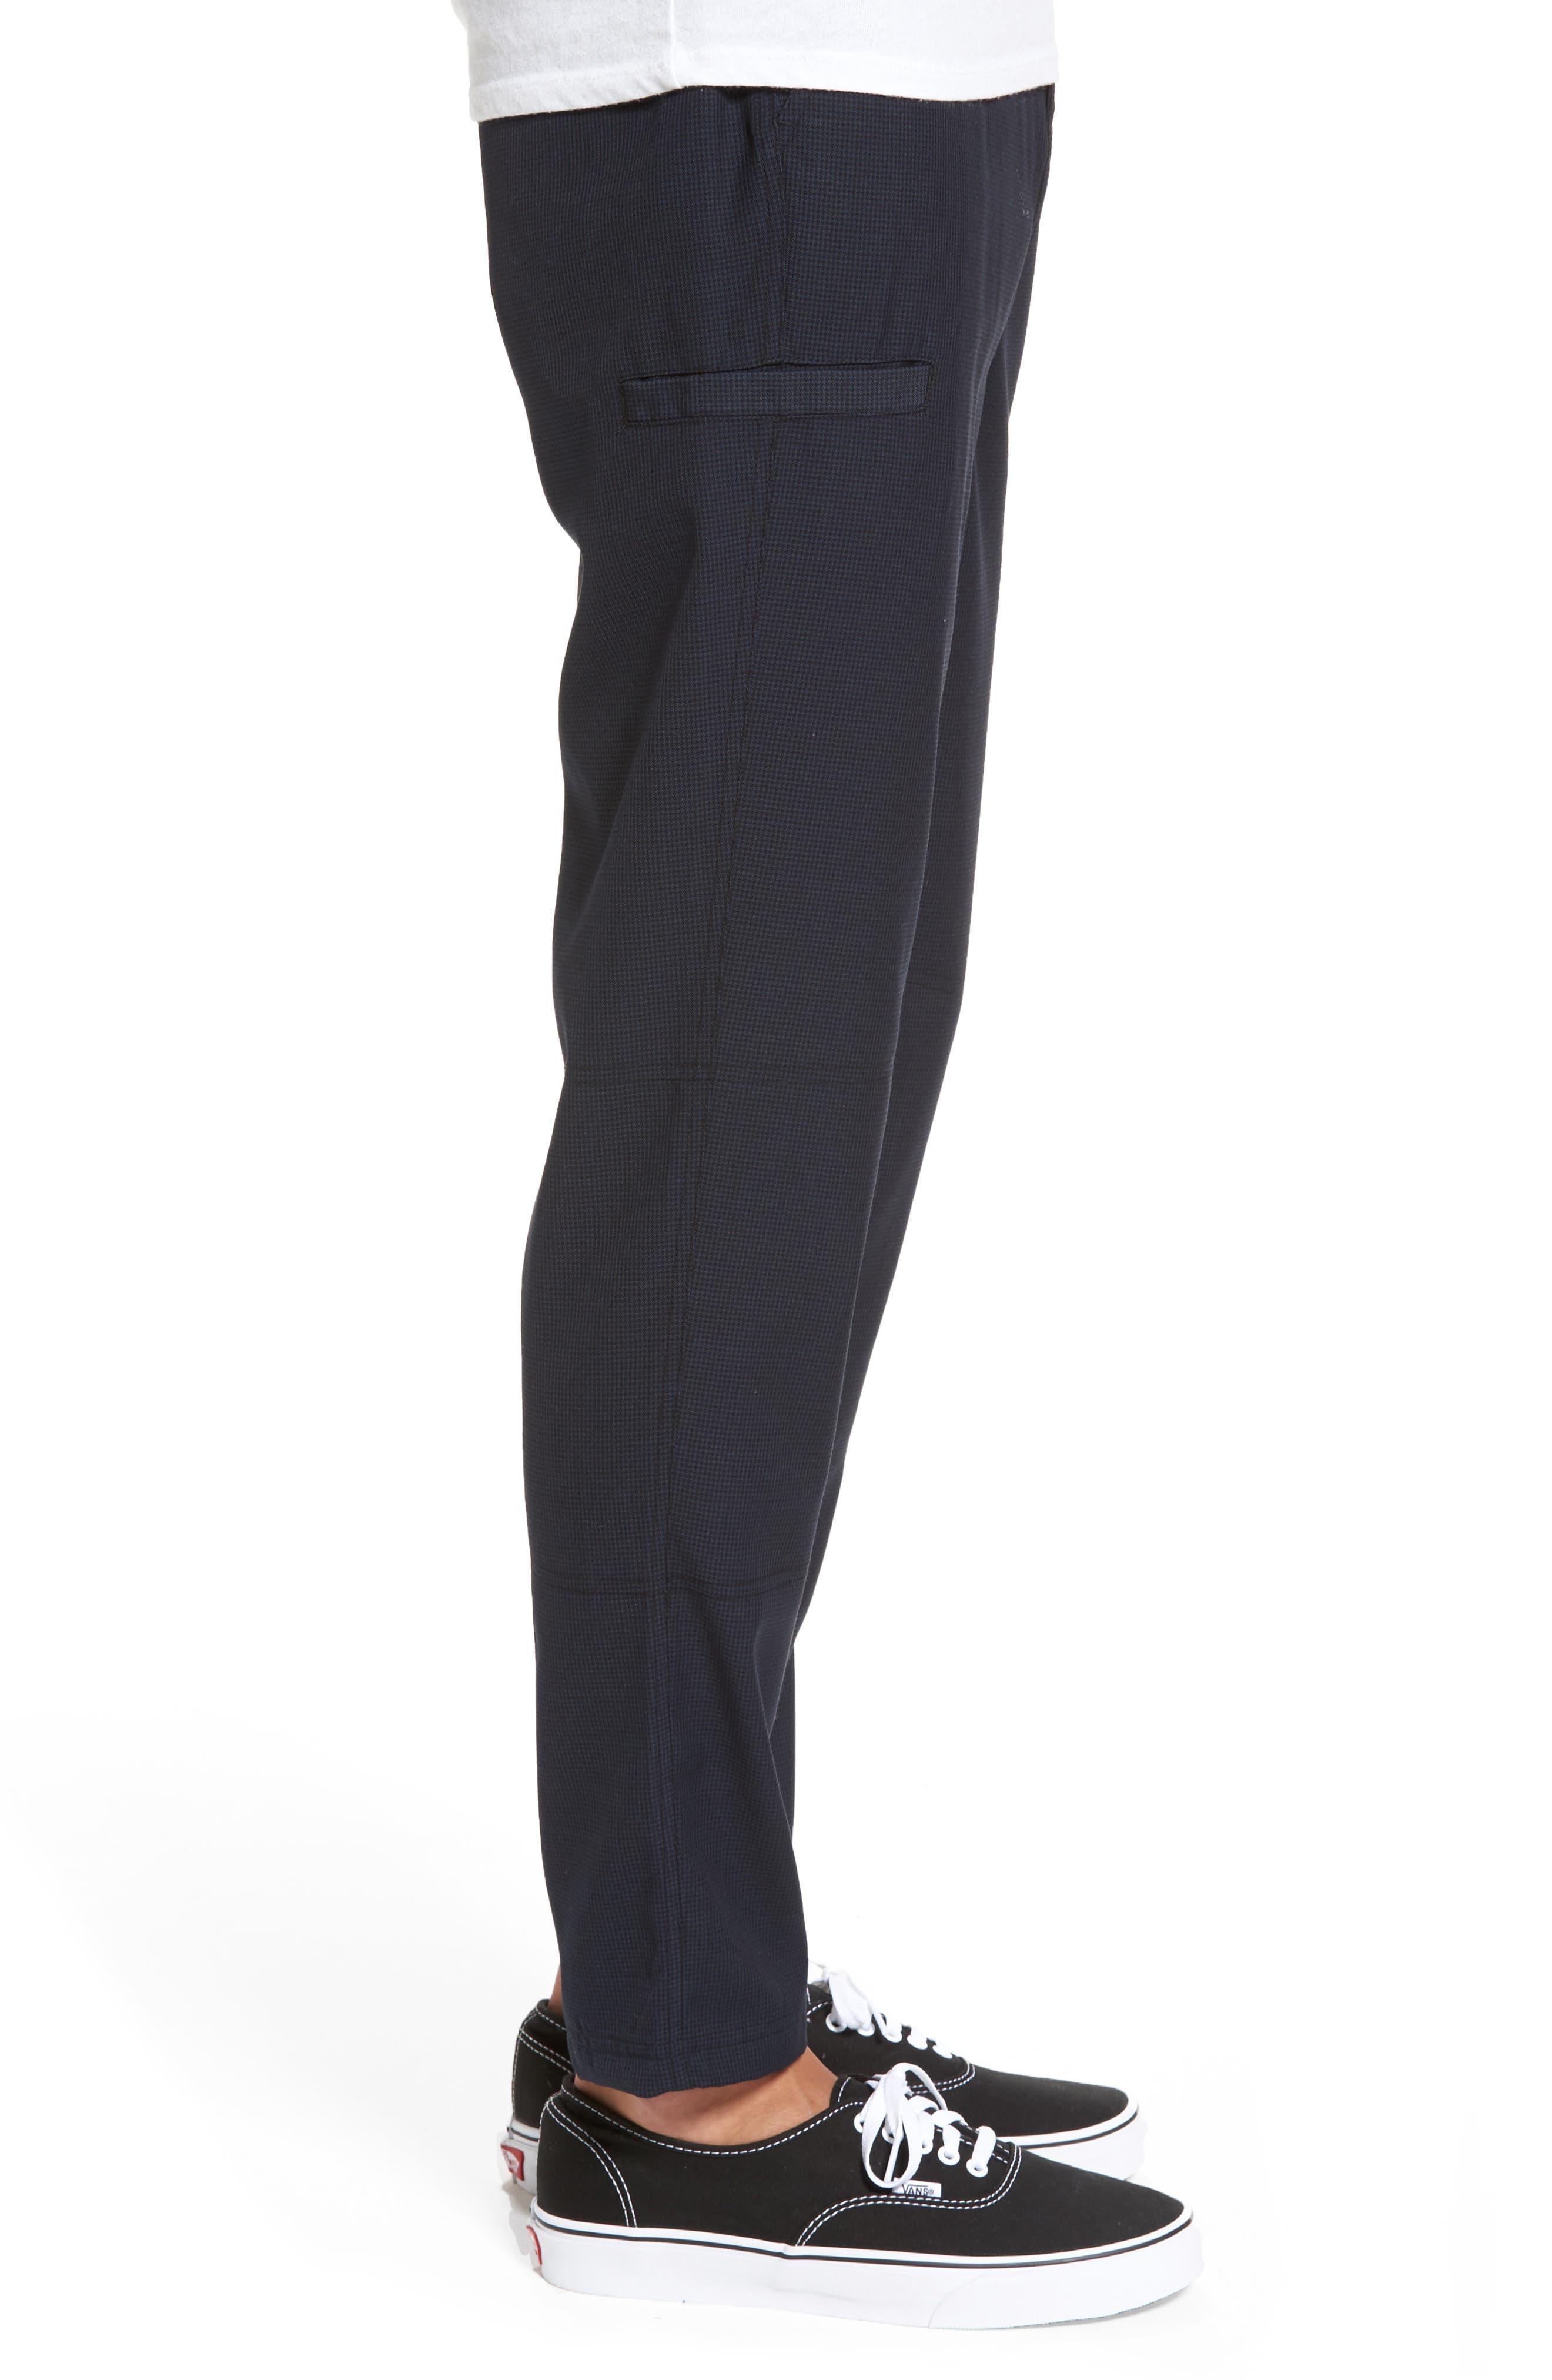 Haycroft Trousers,                             Alternate thumbnail 3, color,                             Navy